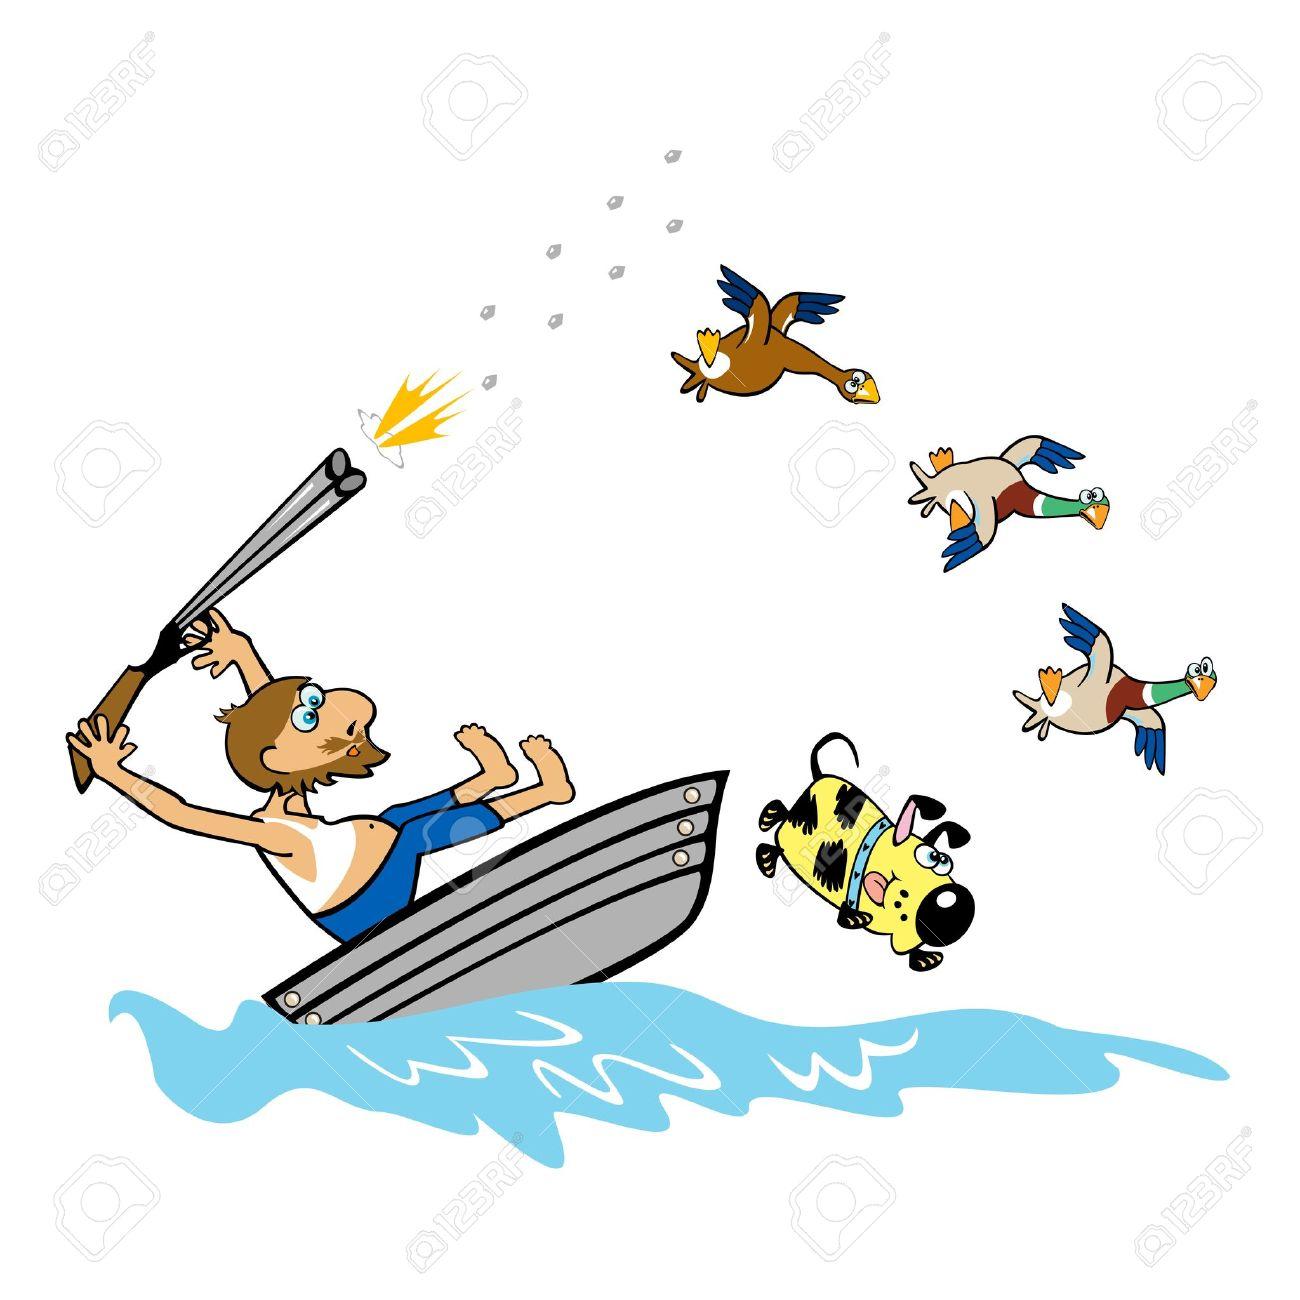 Boating aged man hunting wild duckscartoon illustration on white boating aged man hunting wild duckscartoon illustration on white background stock vector 14676935 sciox Gallery